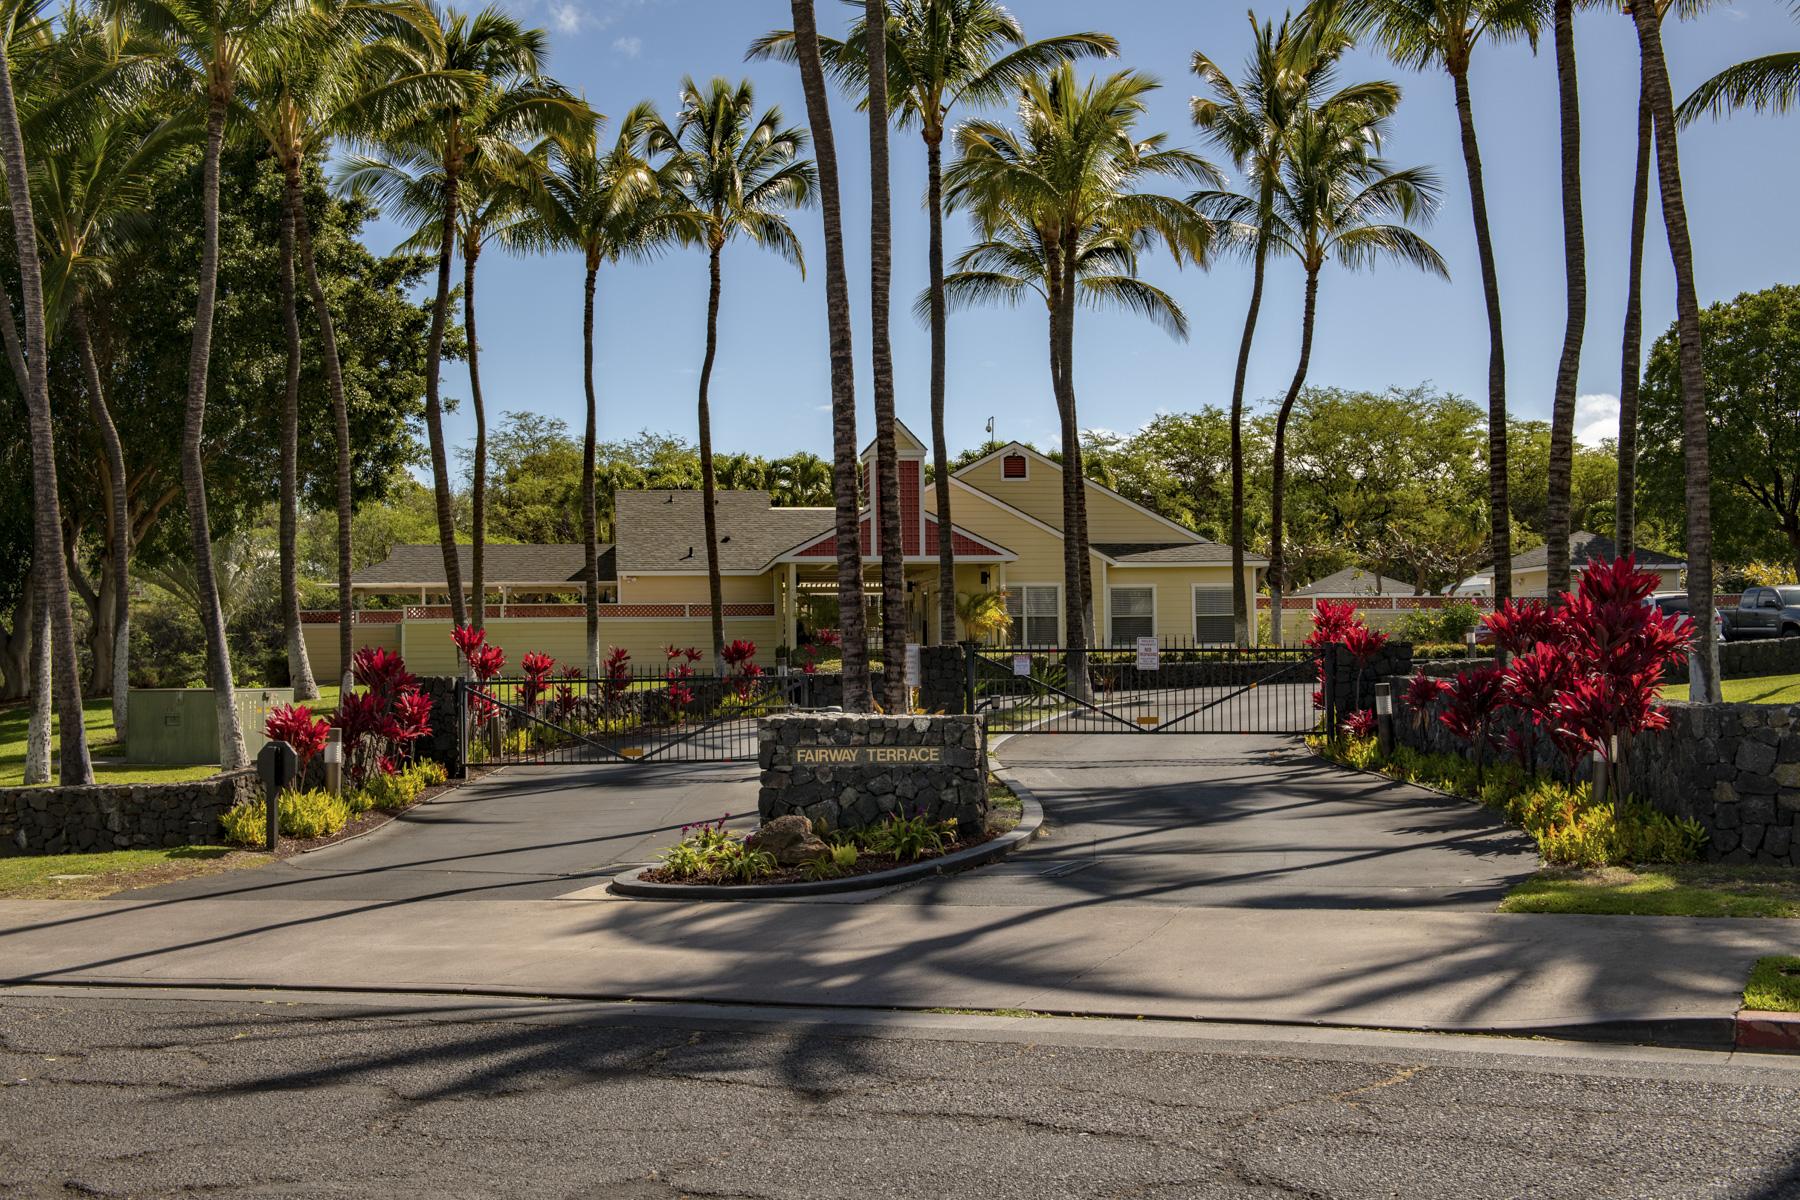 Condominiums for Sale at 68-3831 Lua Kula Street, I201, Waikoloa Village, HI 96738 68-3831 Lua Kula Street, I201 Waikoloa, Hawaii 96738 United States